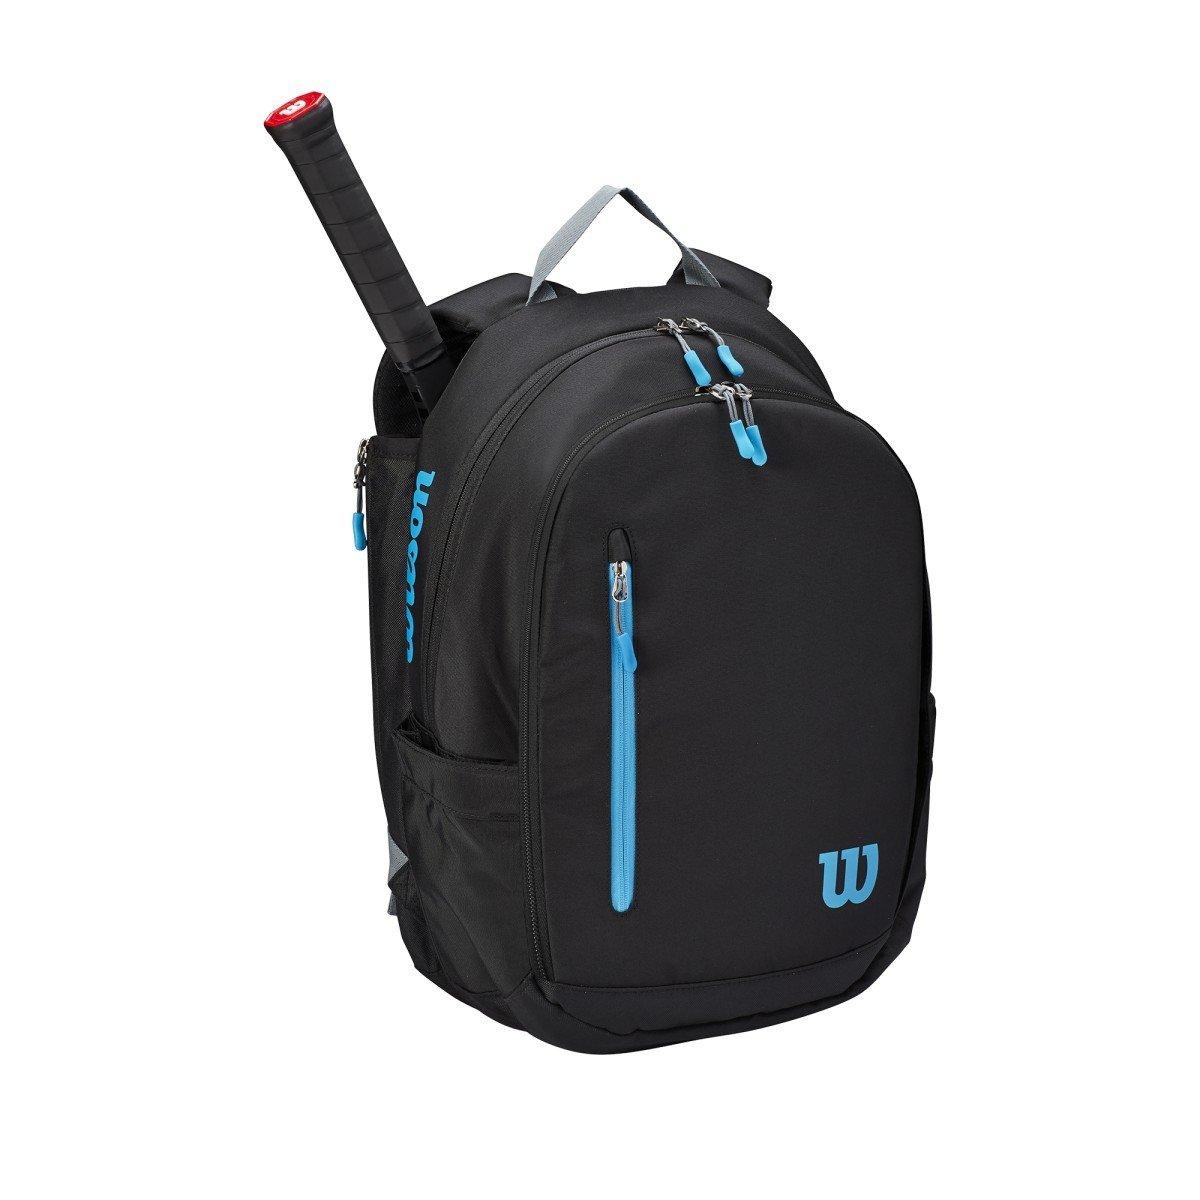 Wilson Tennis Backpack – Ultra Backpack